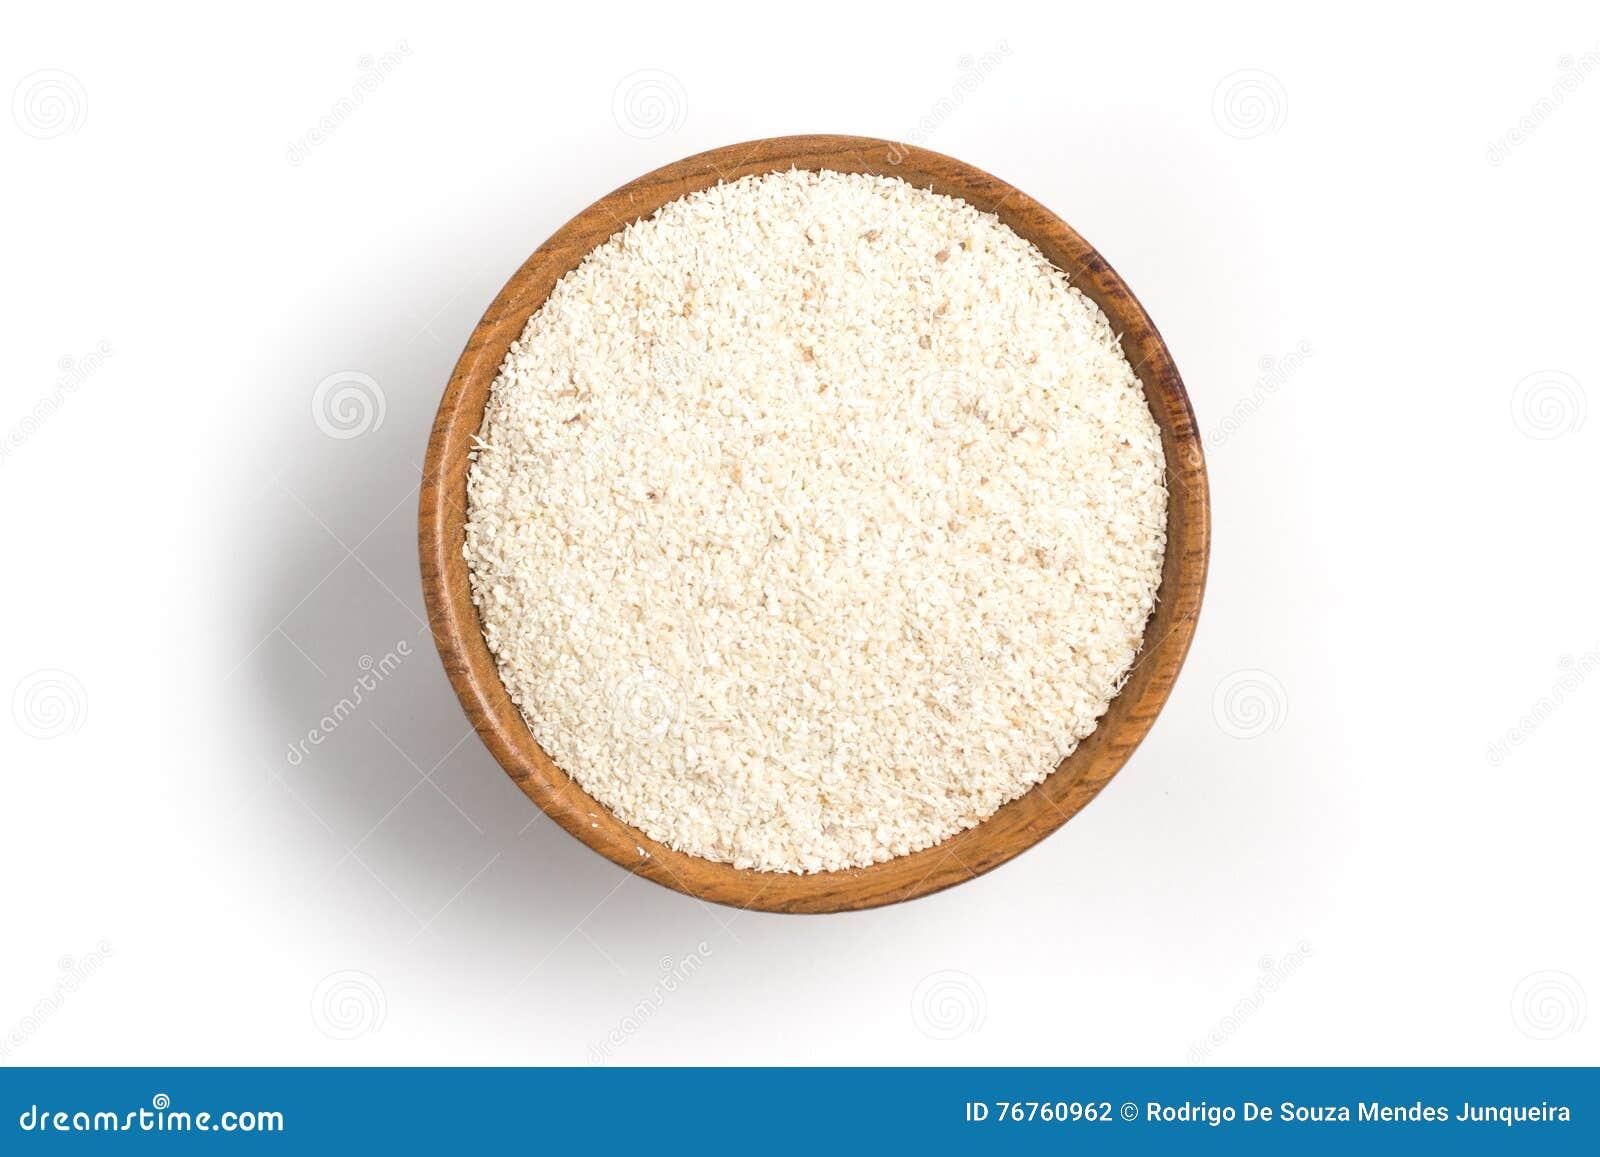 Farinha De Mandioca maniok Kasawy mąka Farofa